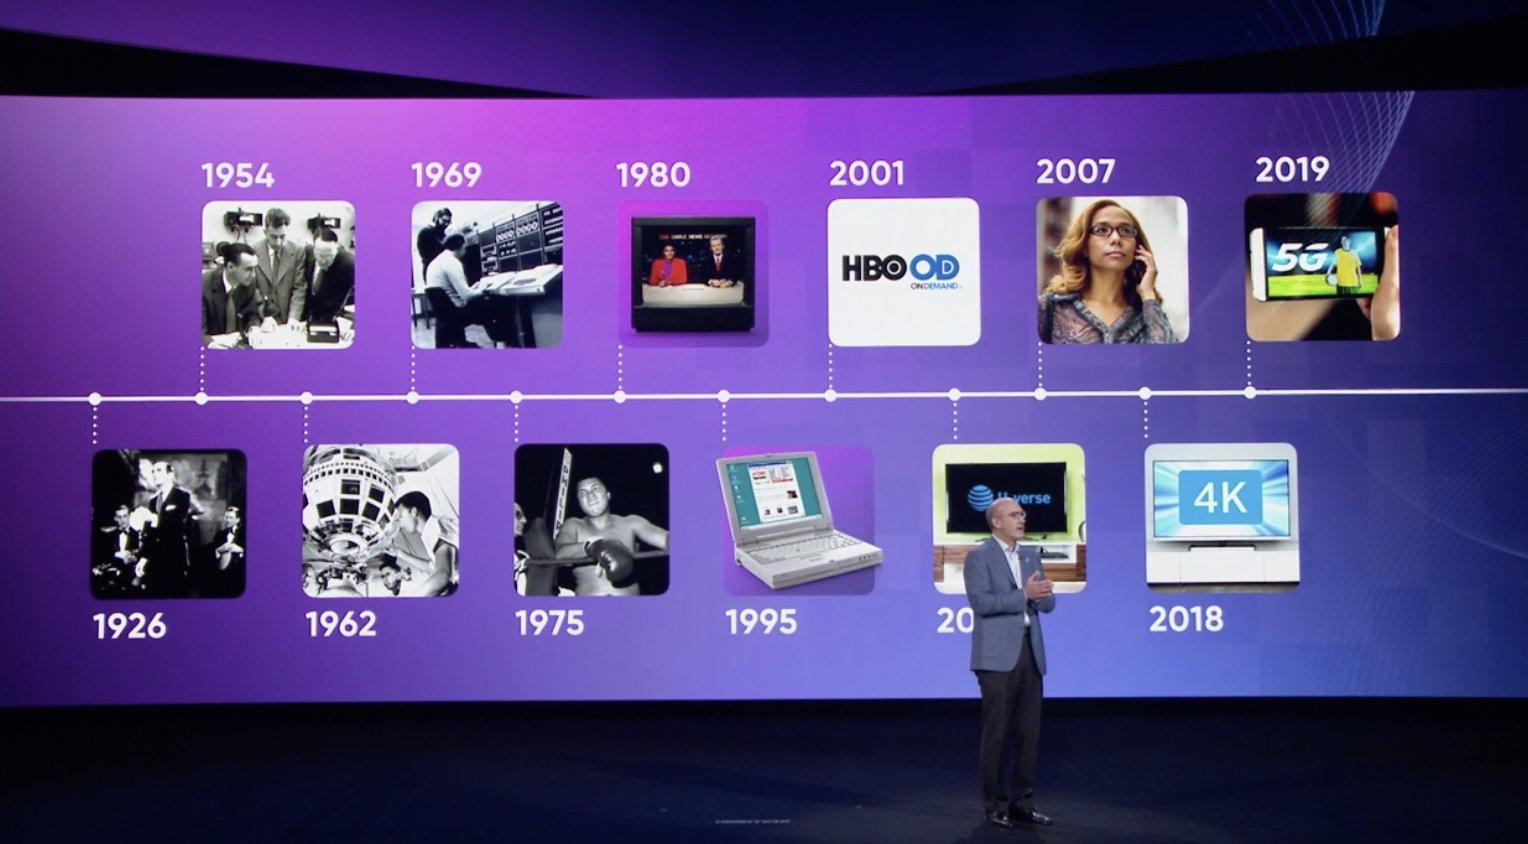 ATT CEO John Stankey give talk on streaming services